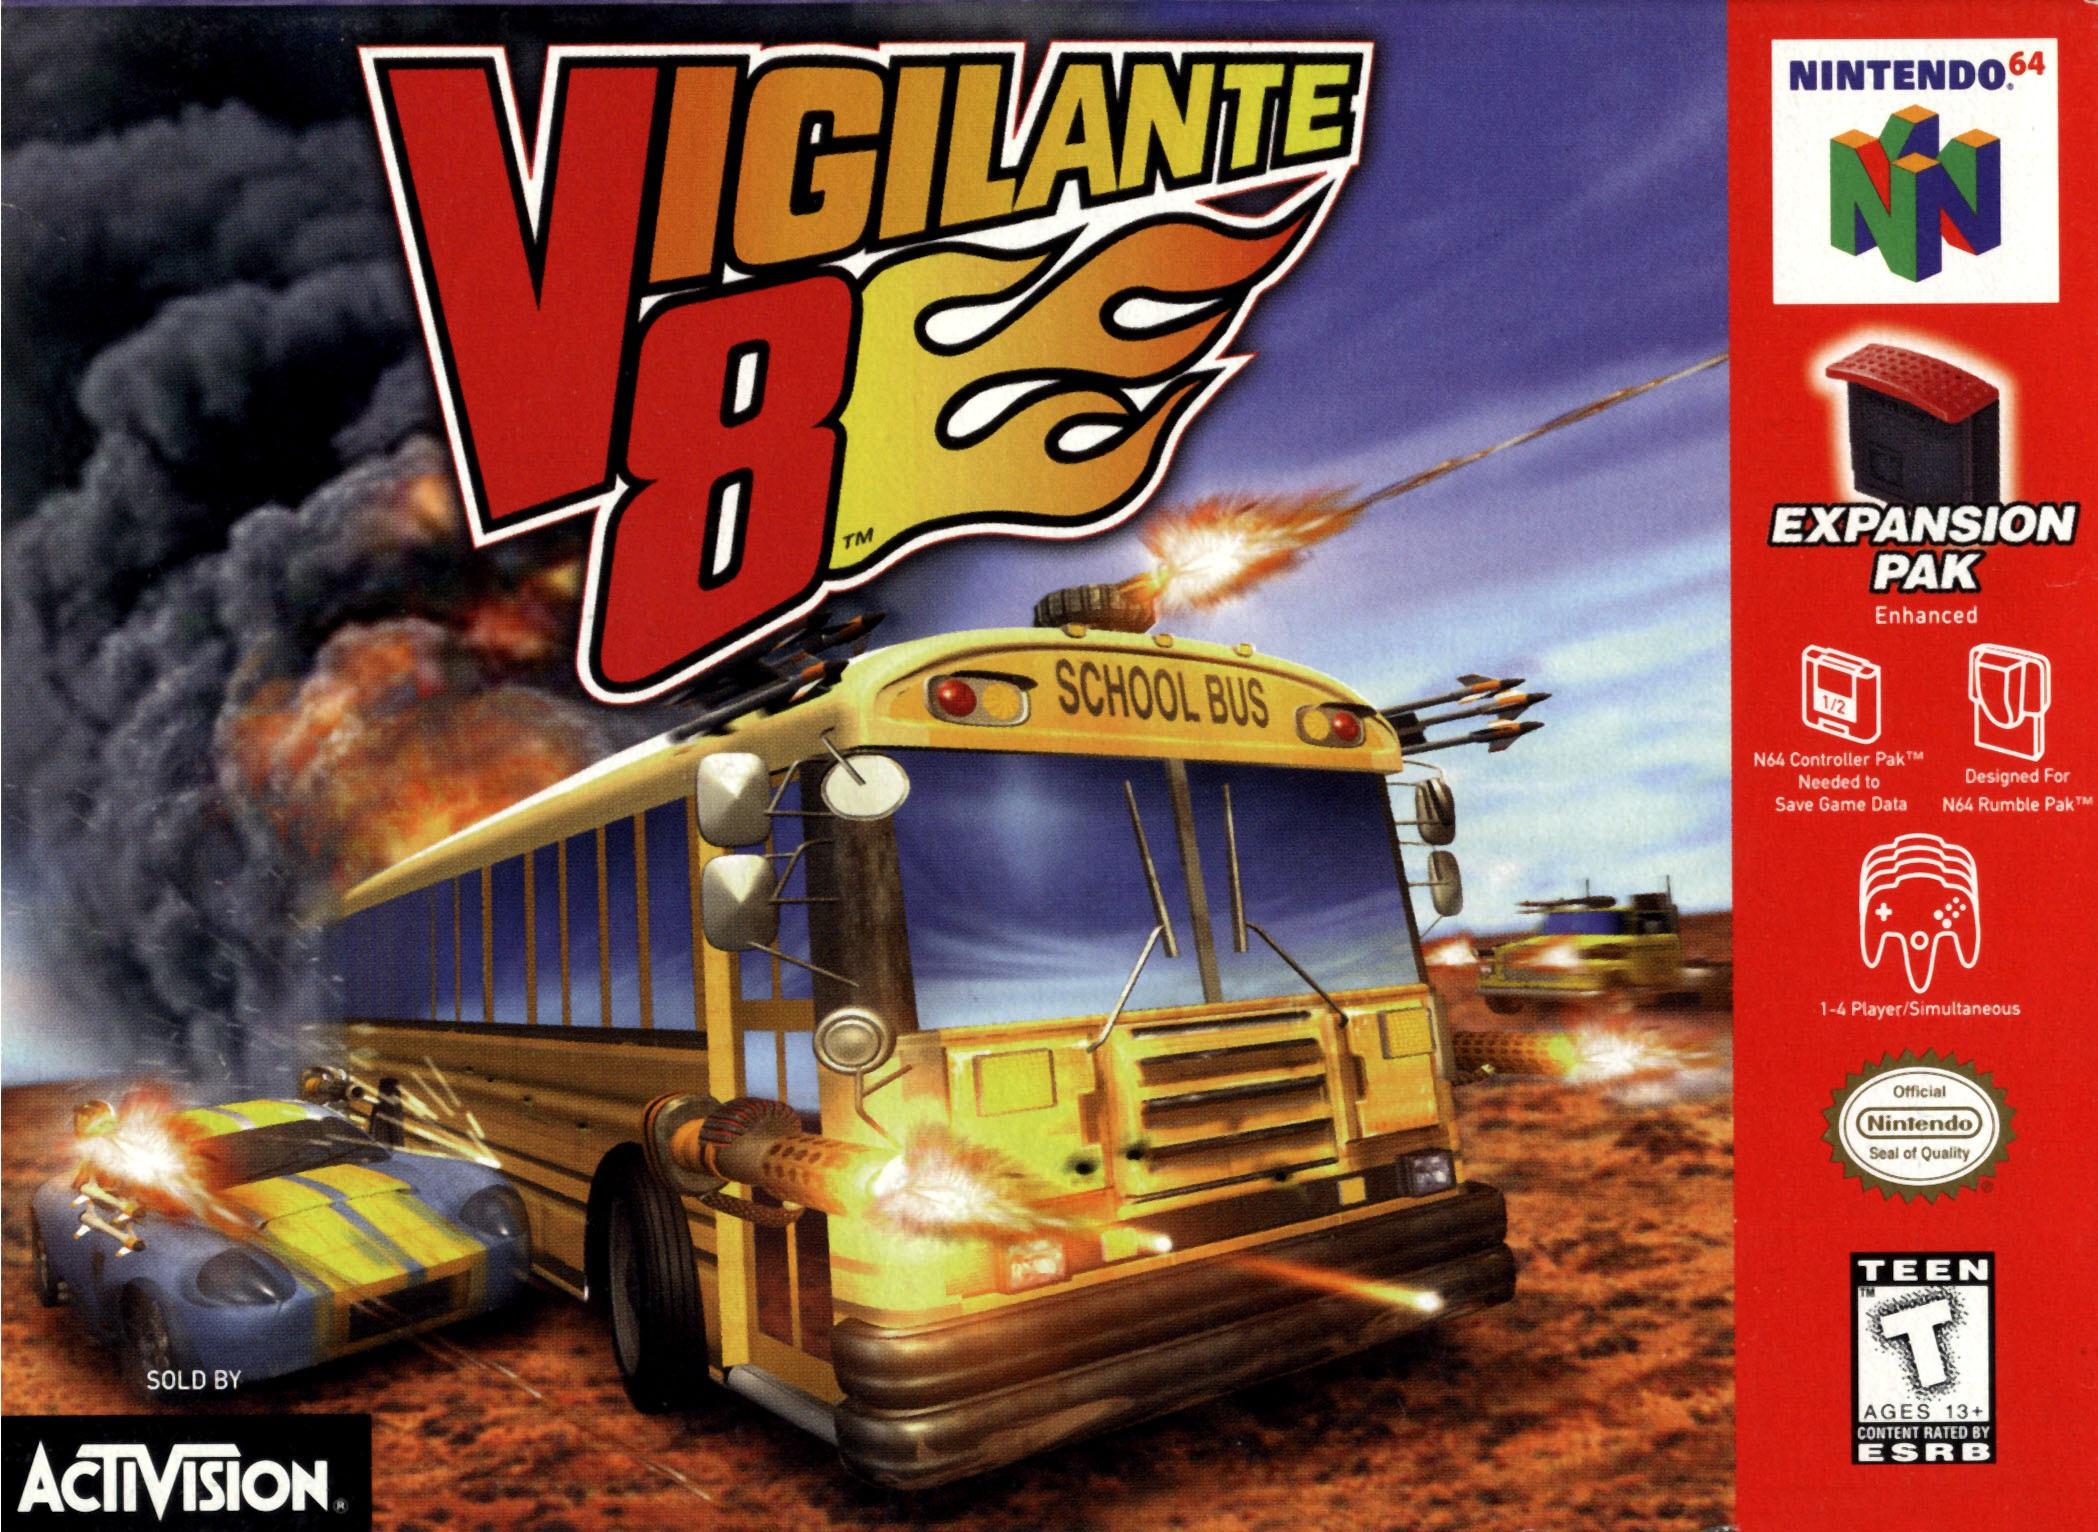 n64_vigilante_8_p_wcbuiu.jpg